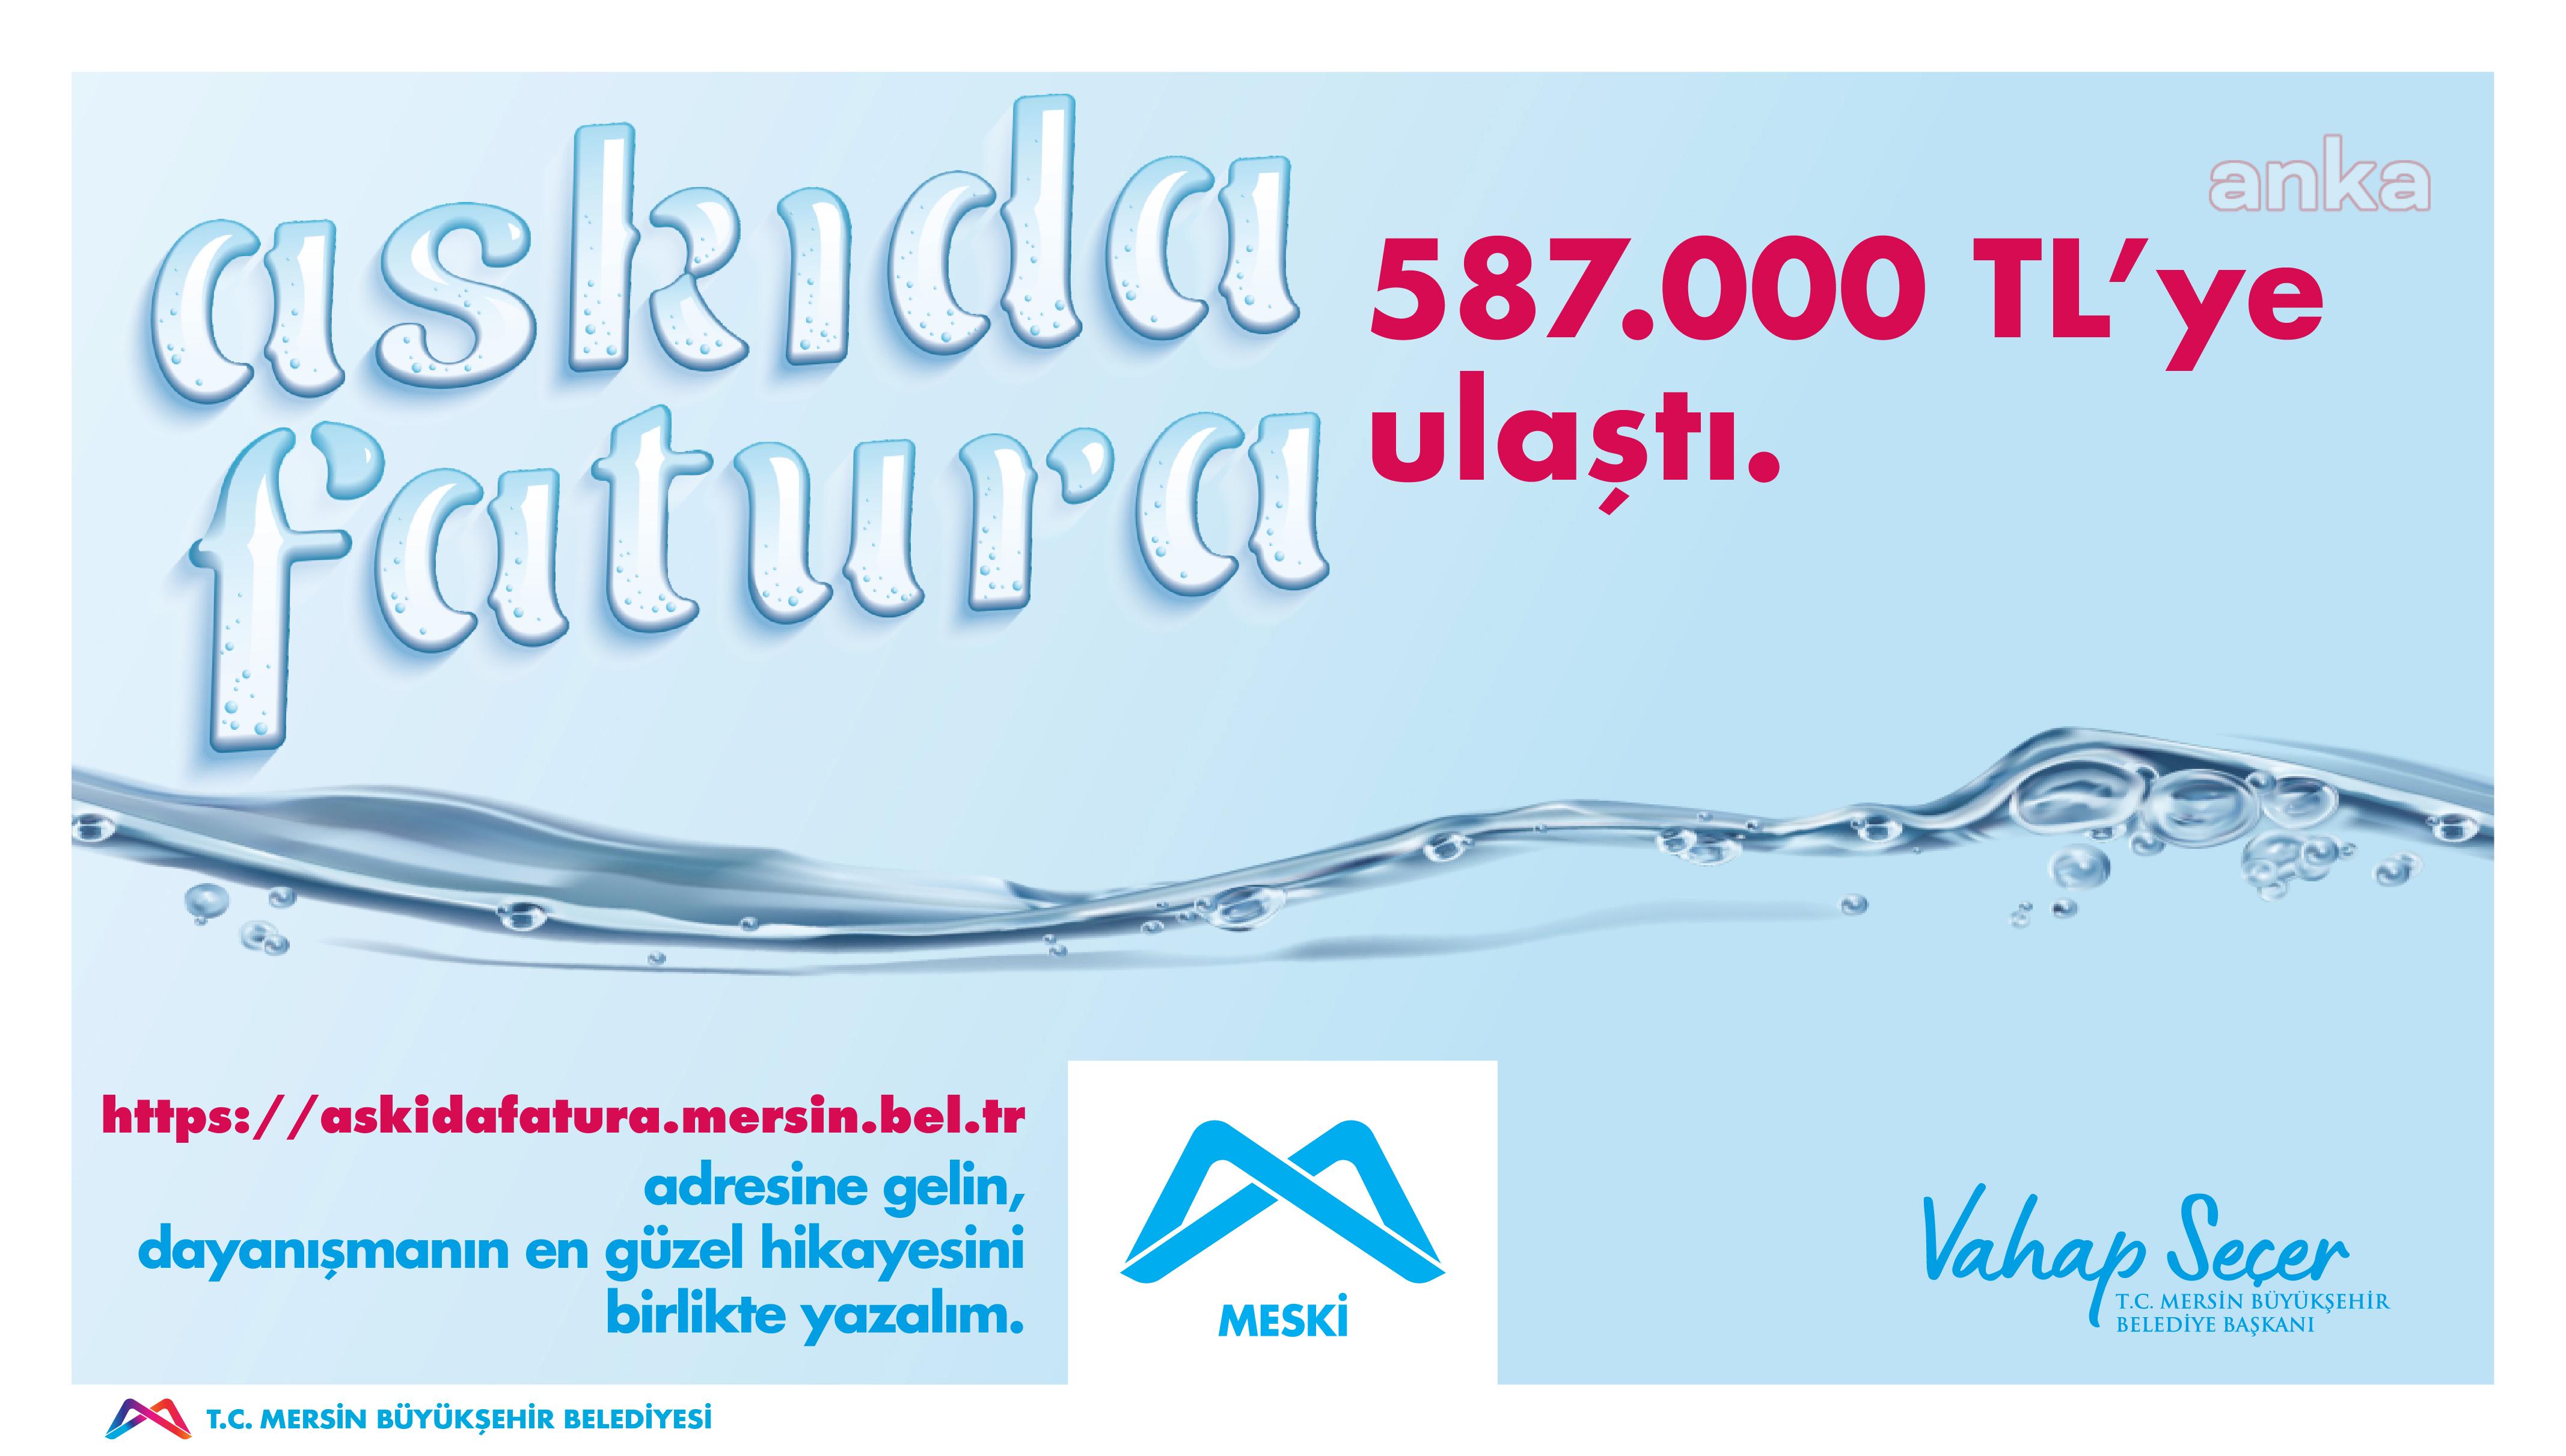 Mersin'de Askıda Fatura kampanyasına bir ayda 582.081 TL